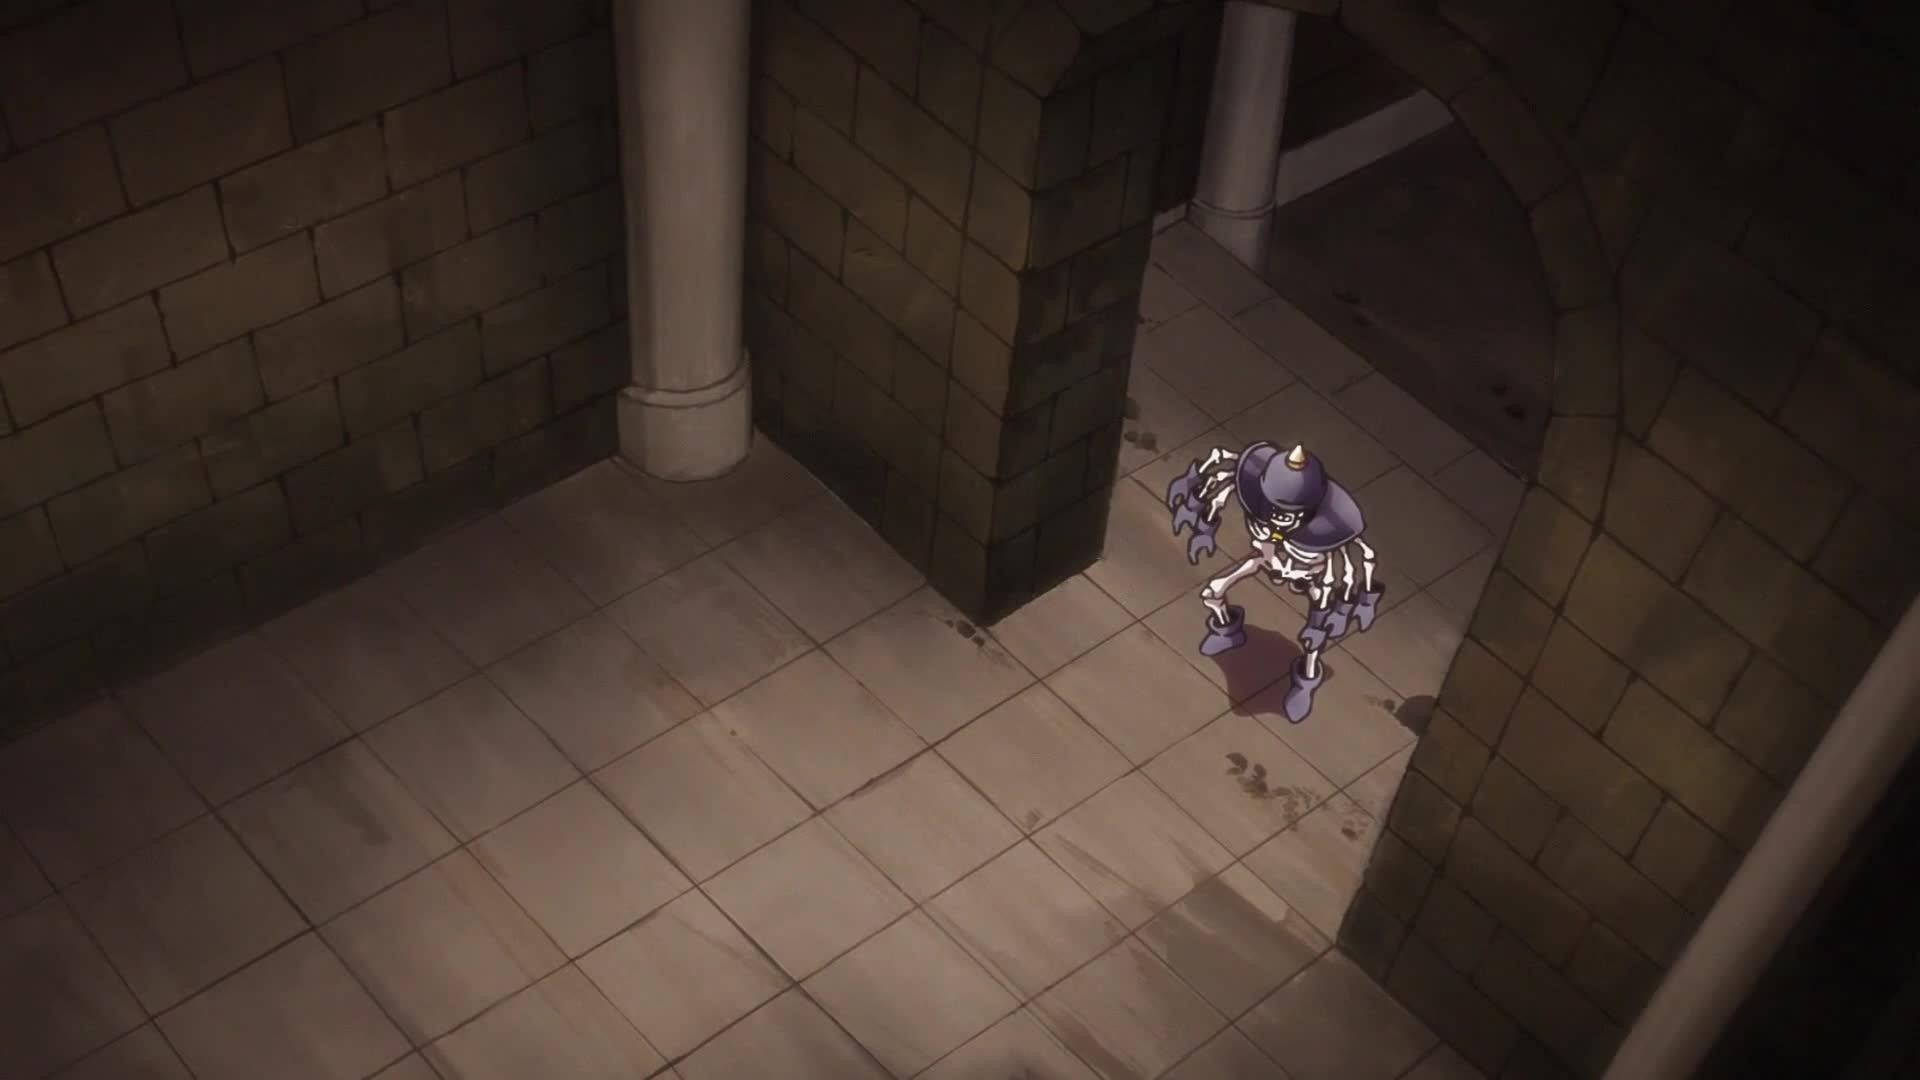 Dragon Quest: Dai no Daibouken (2020) - Ep. 13 - SubsPlease